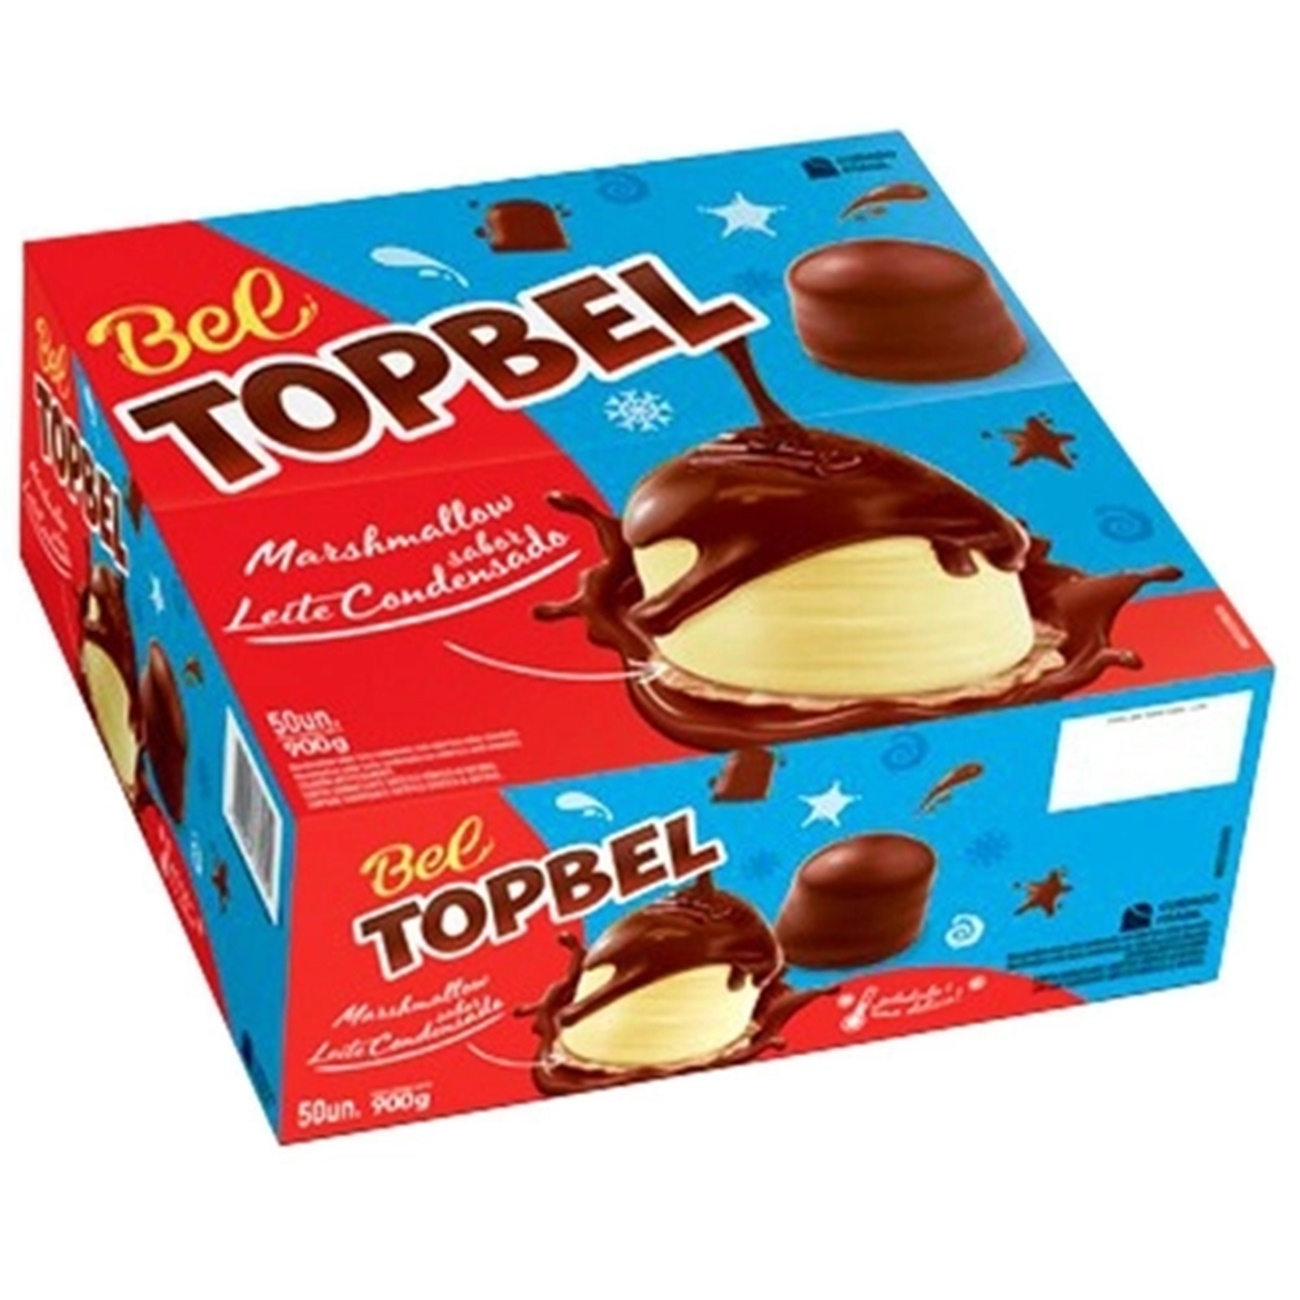 Marshmallow Chocolate Top Bels Leite Condensado c/50 - Bel